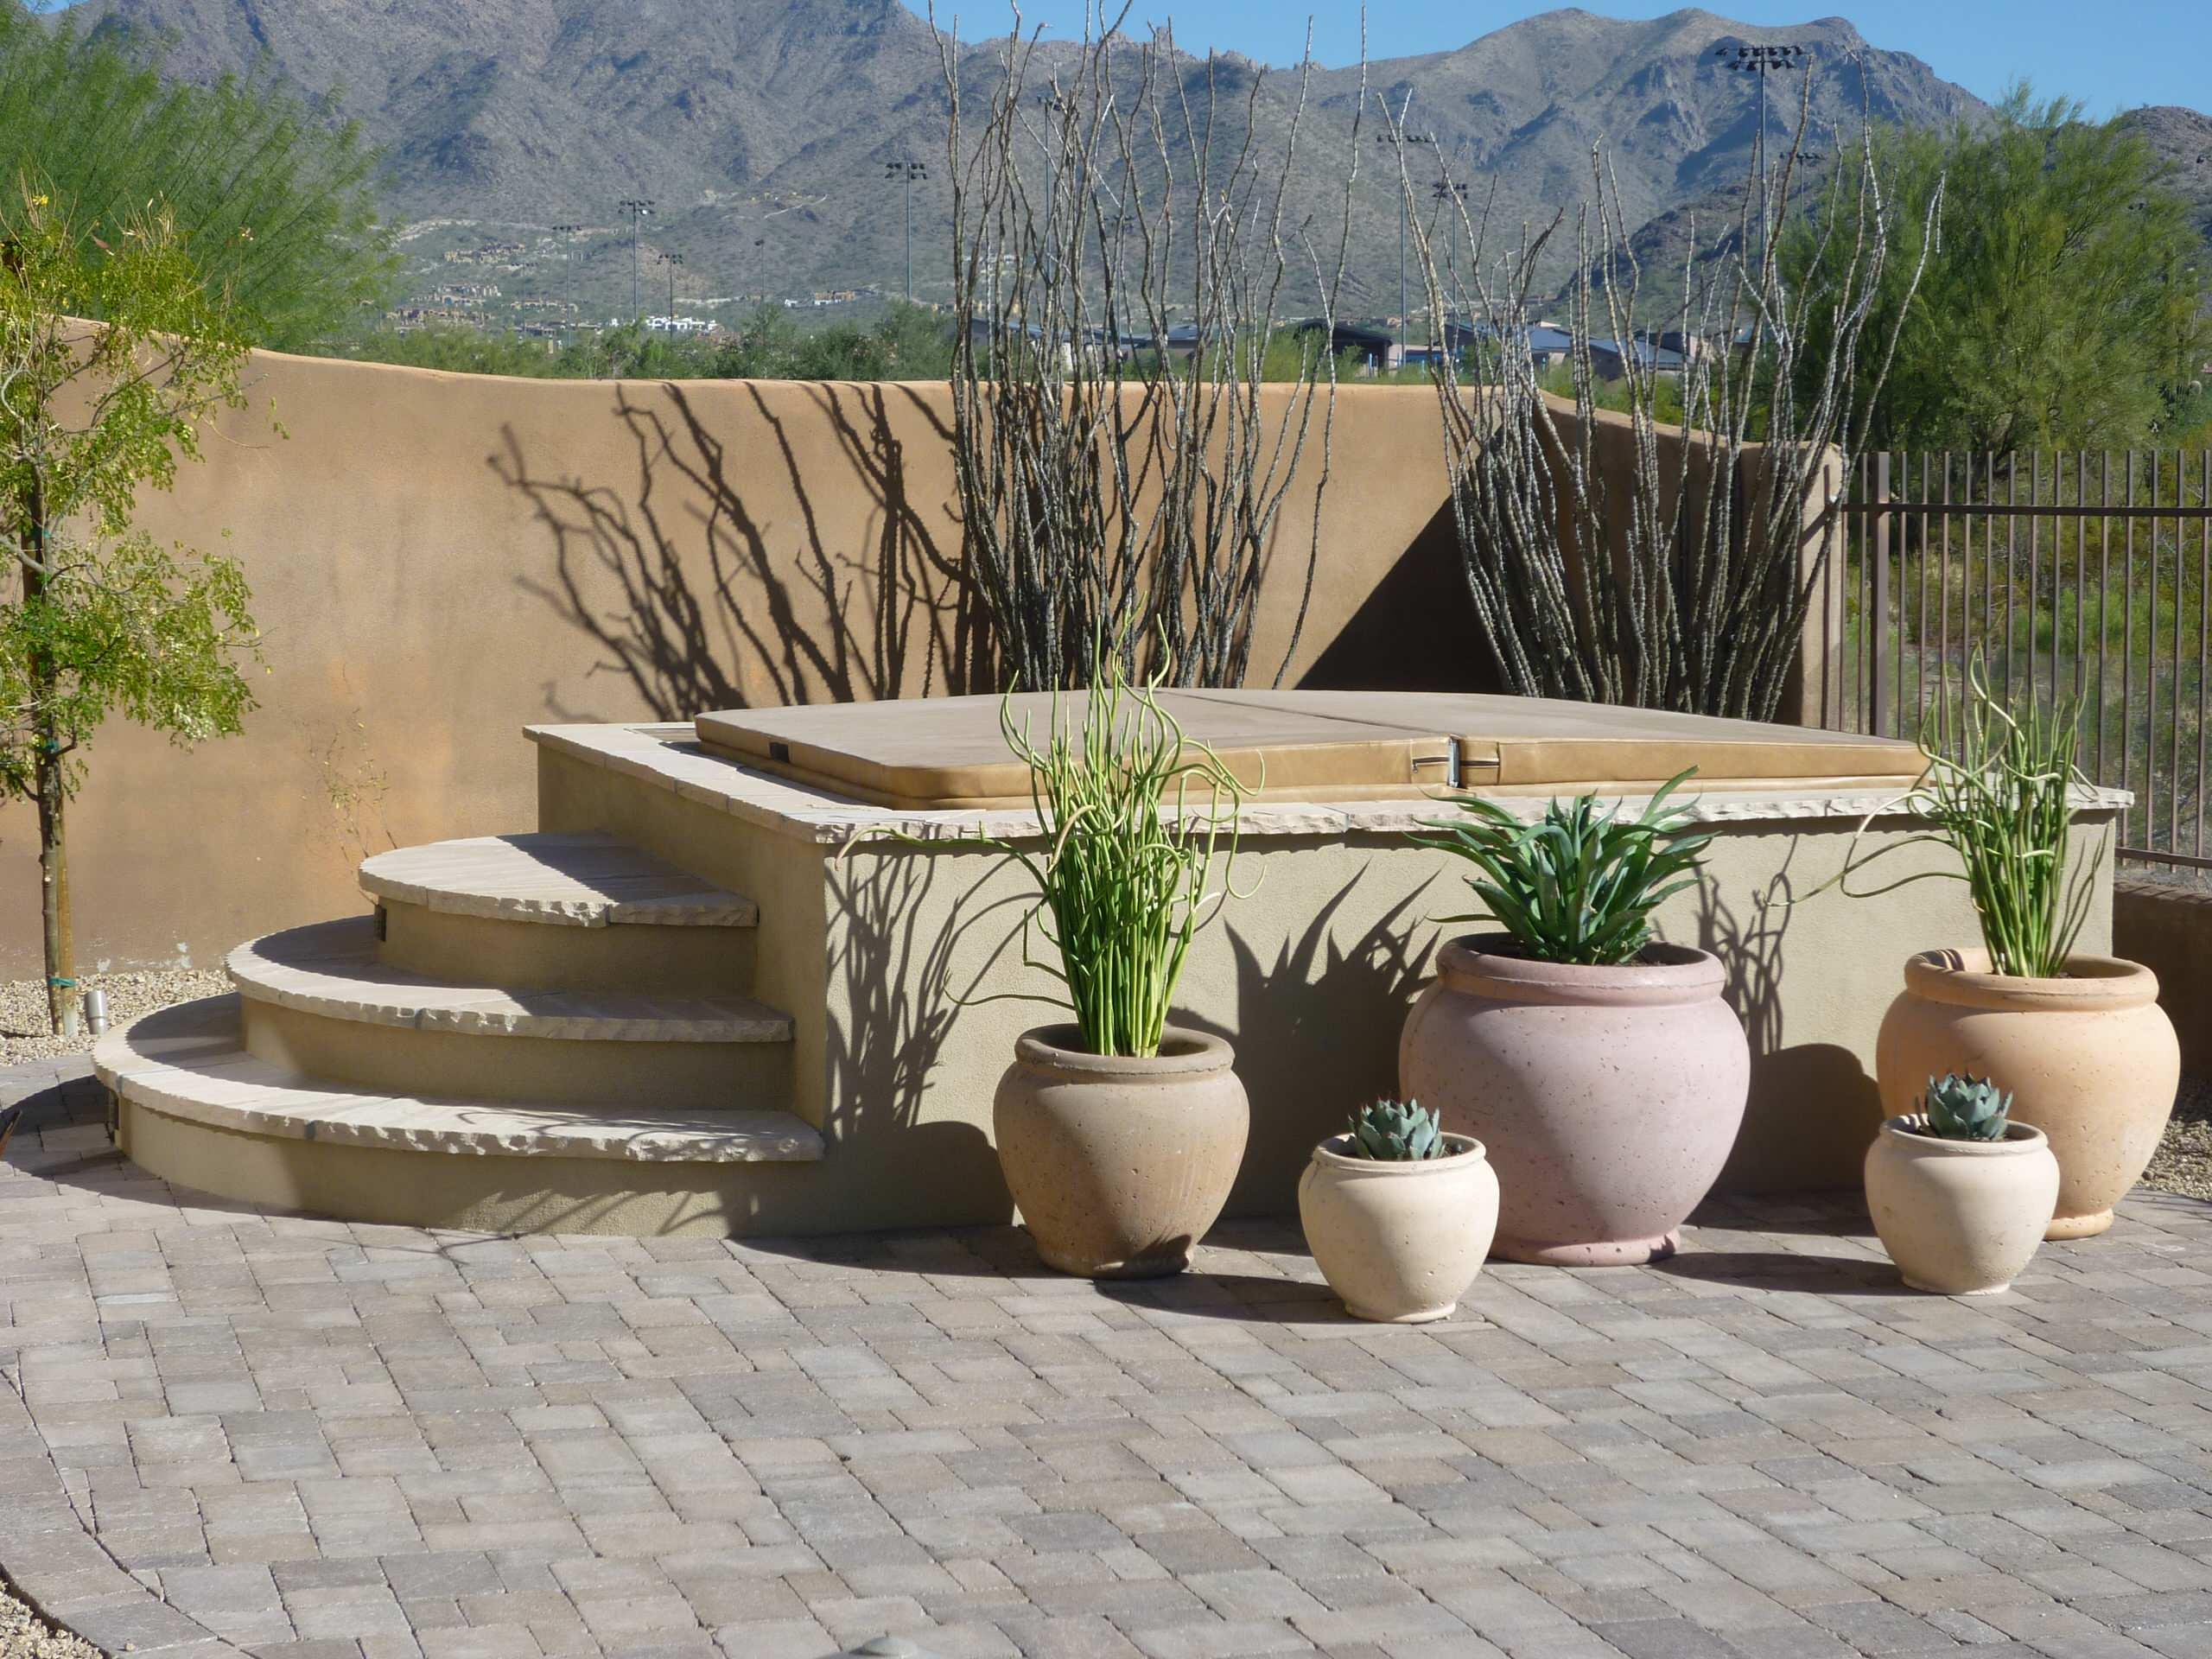 Enclosed Spa & Plantings